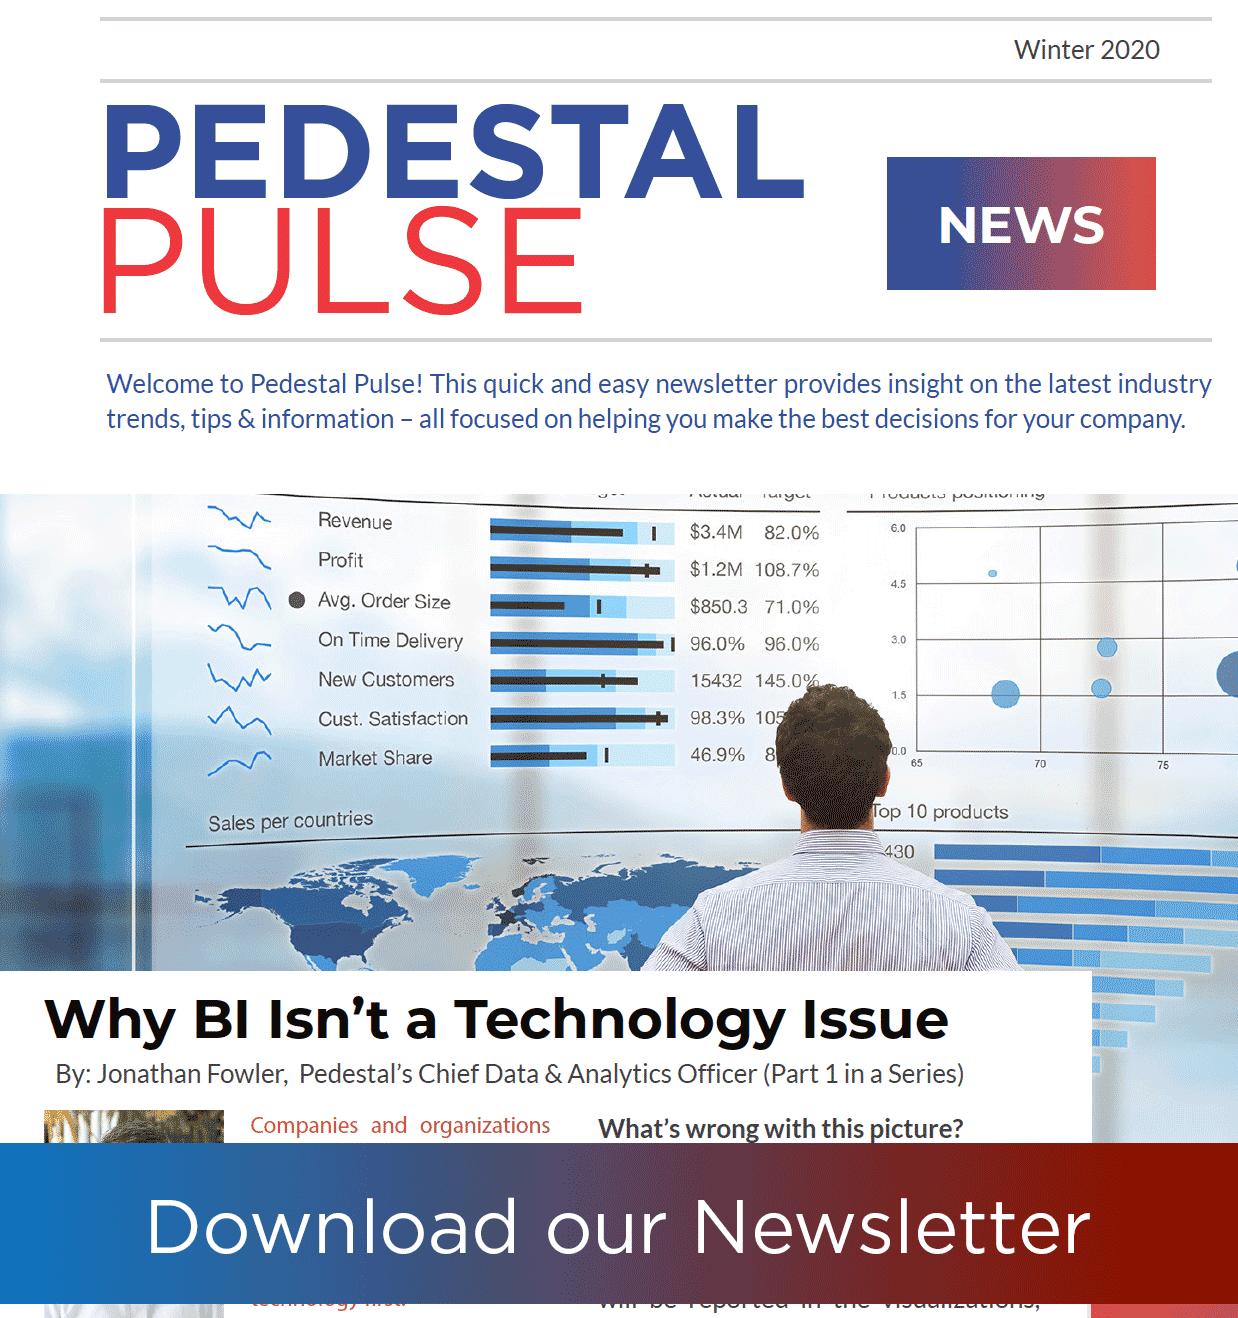 Pedestal-Plus-Winter-Newsletter